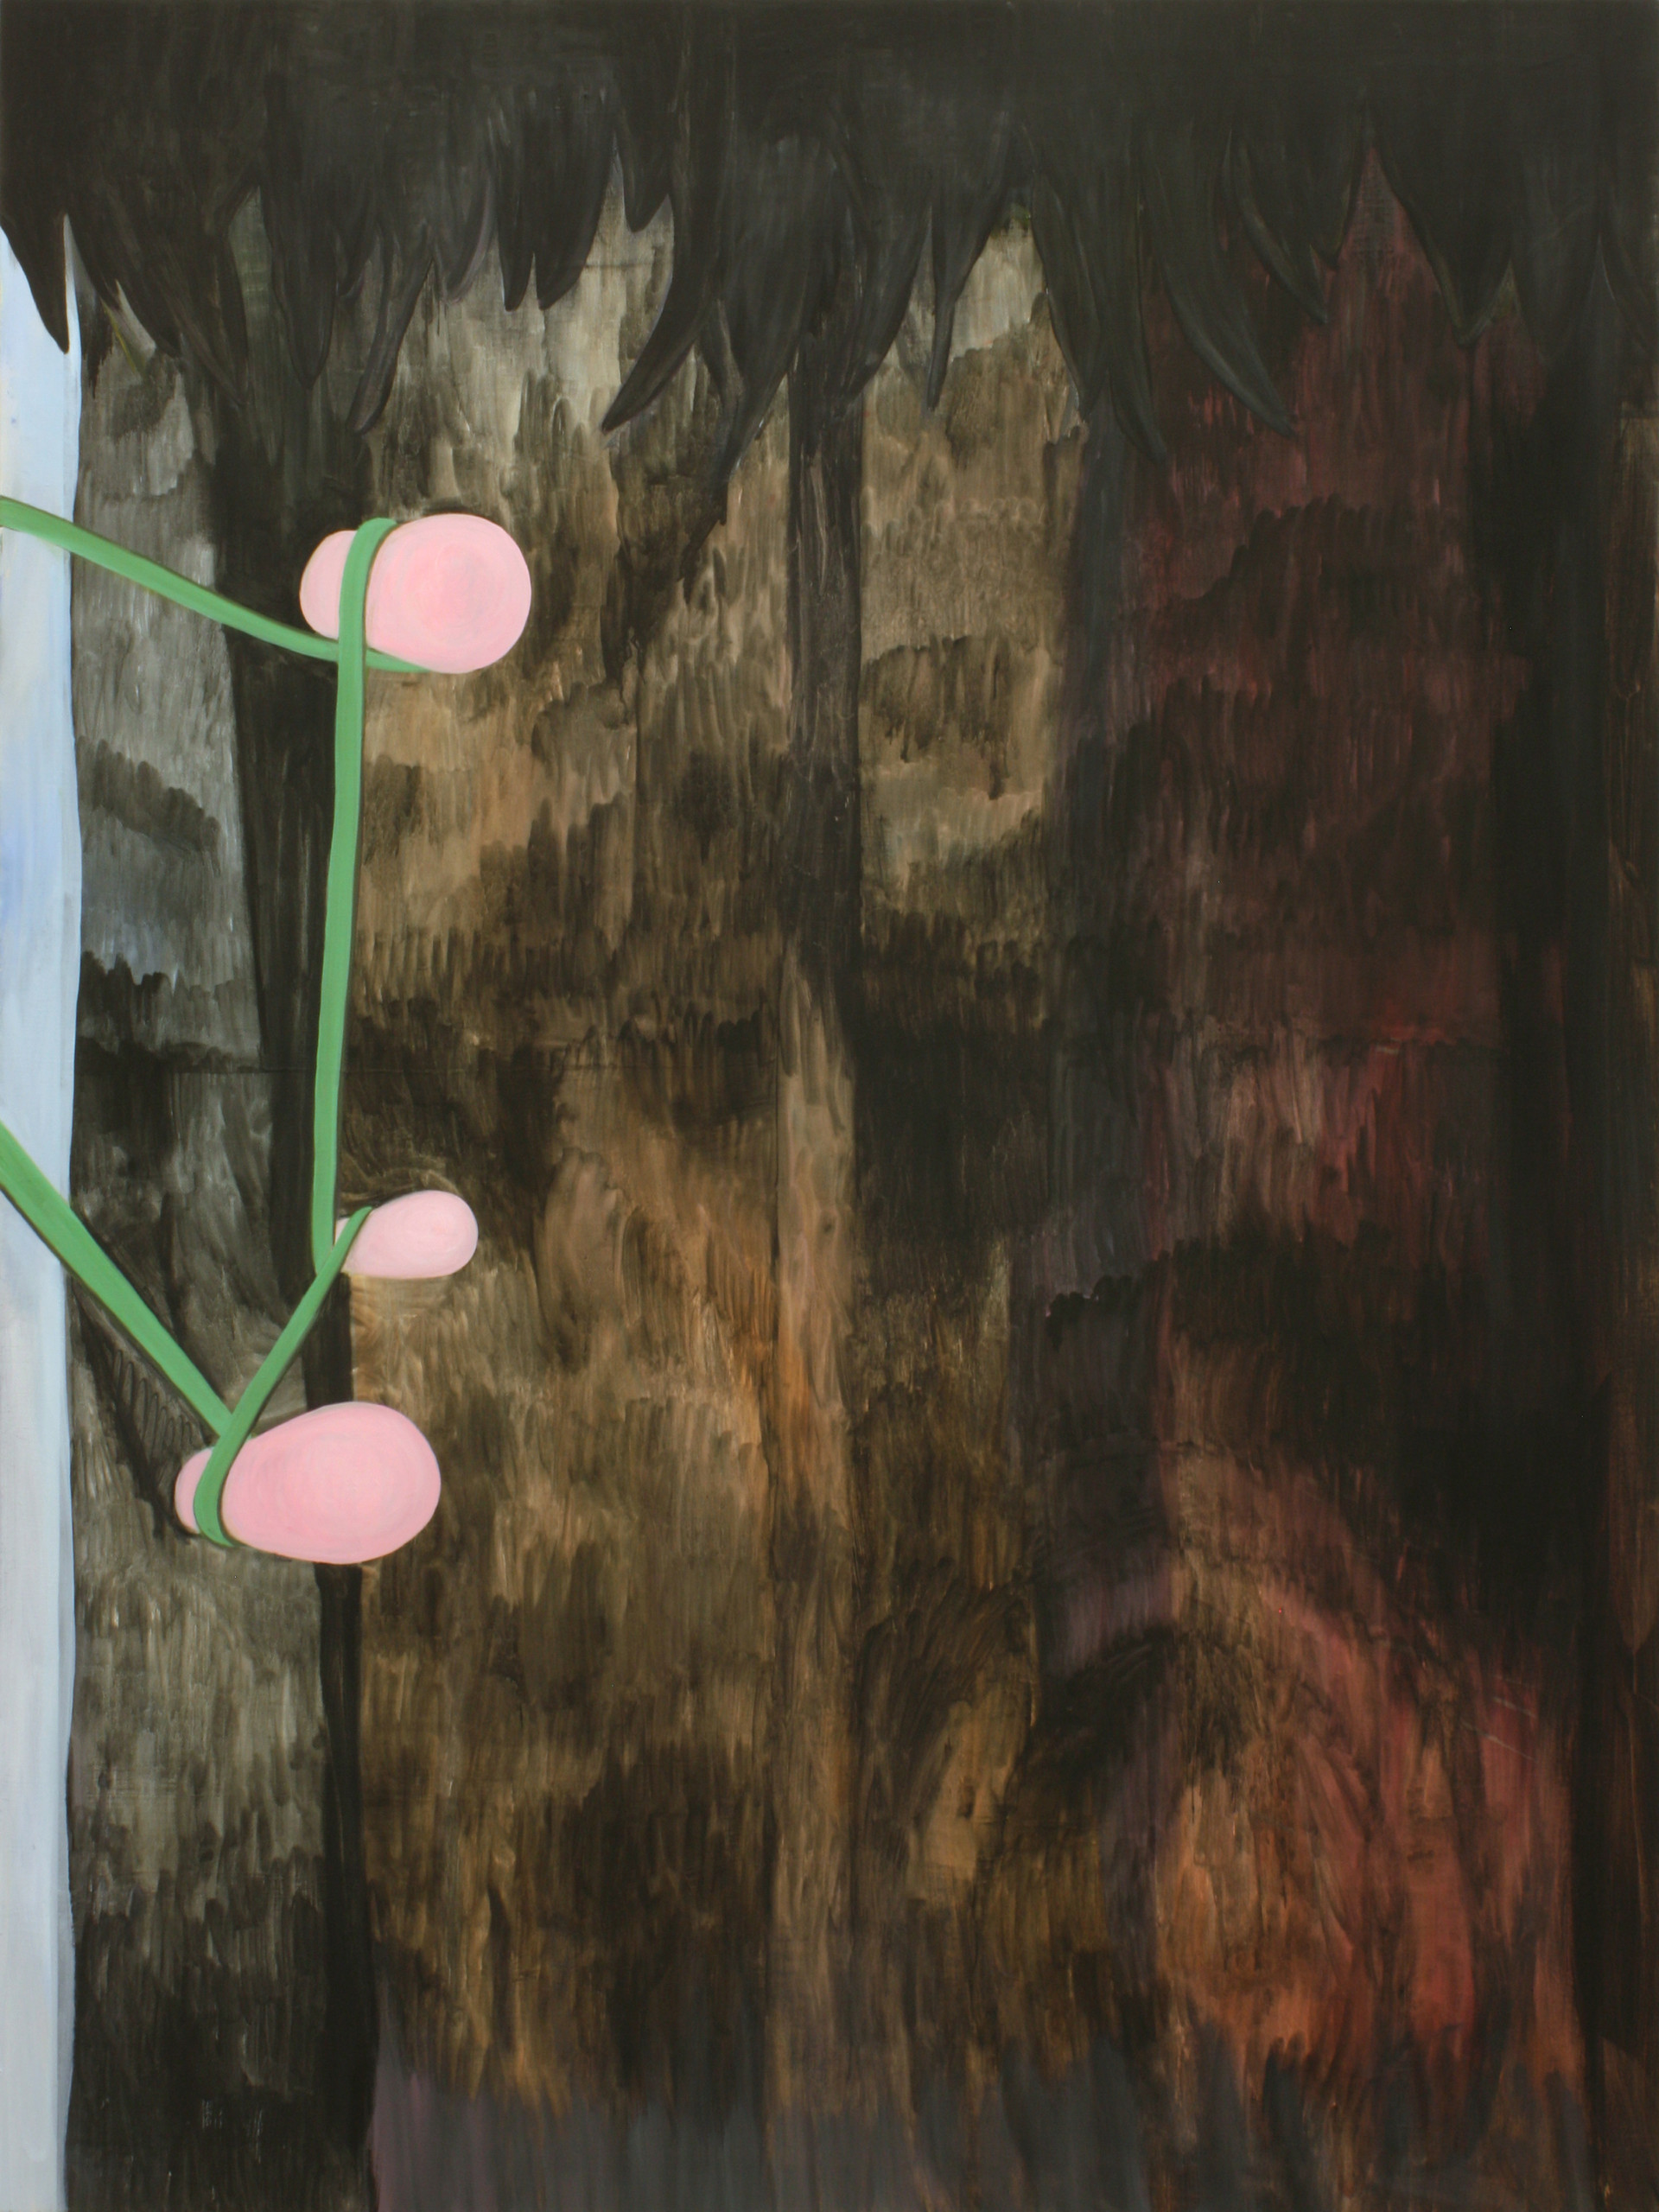 swamp - 2009 - öl auf leinwand - 160 x 120 cm